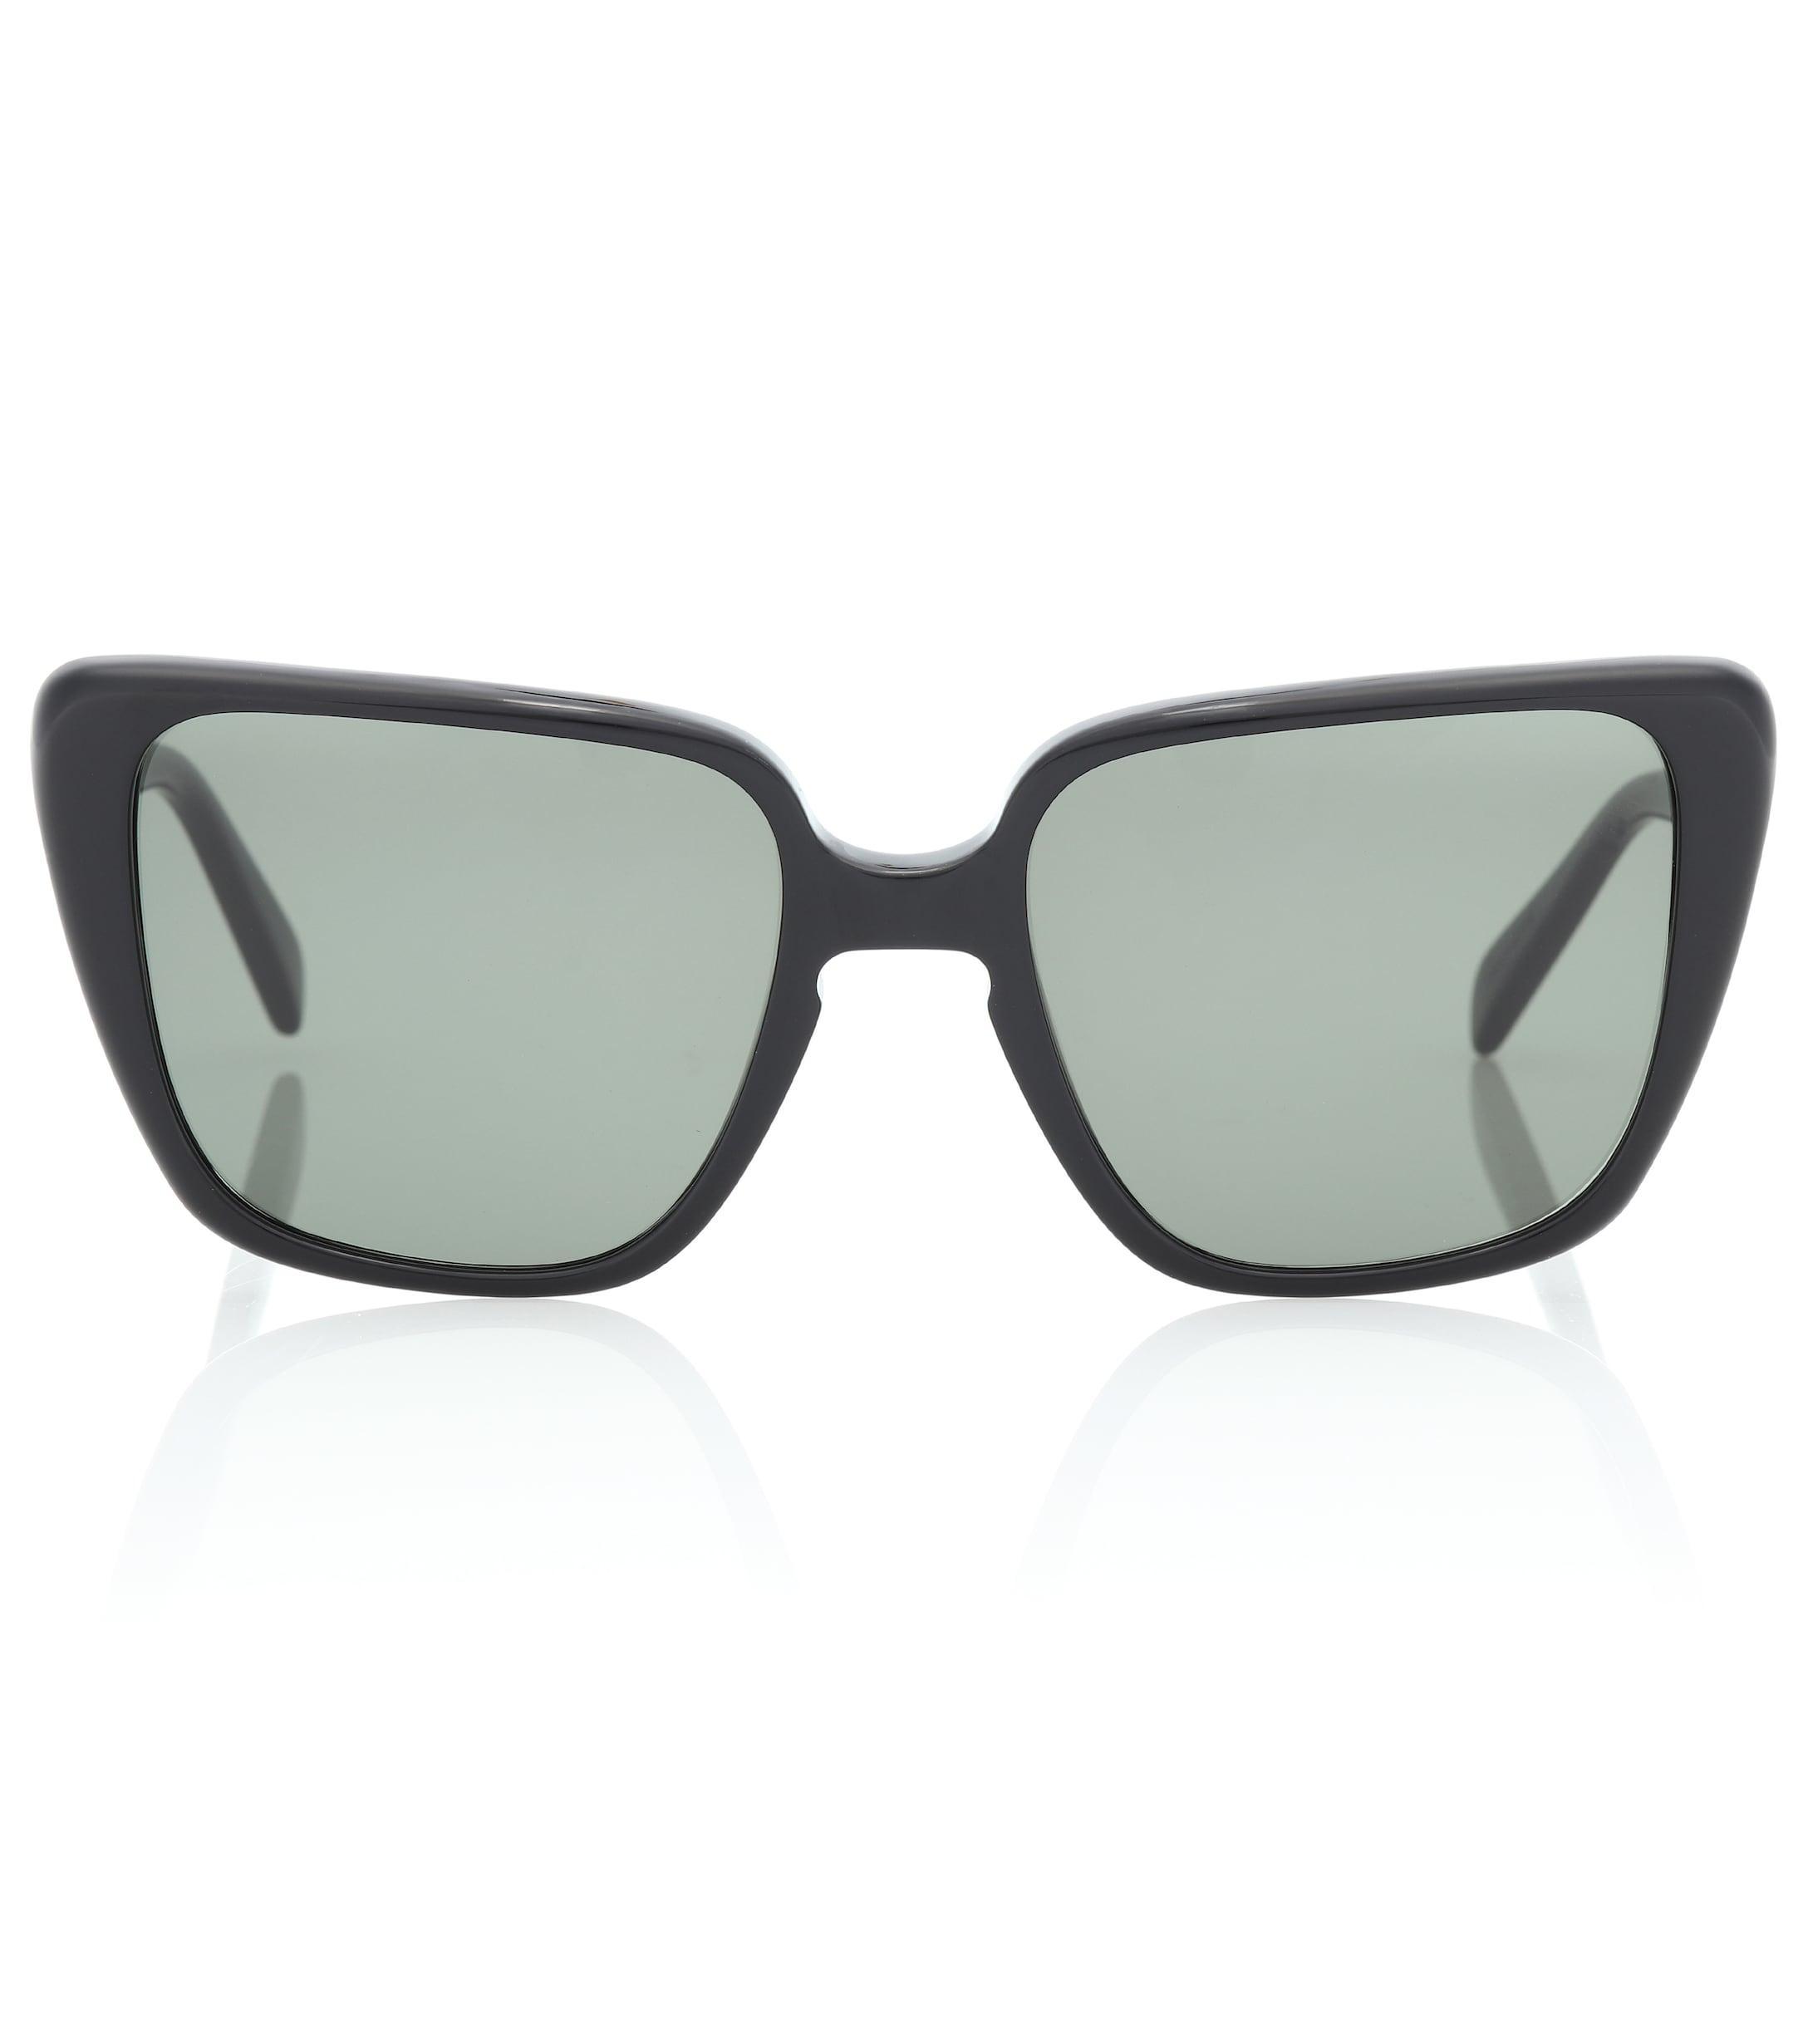 06be996be2e Lyst - Céline Rectangular Butterfly Sunglasses in Black